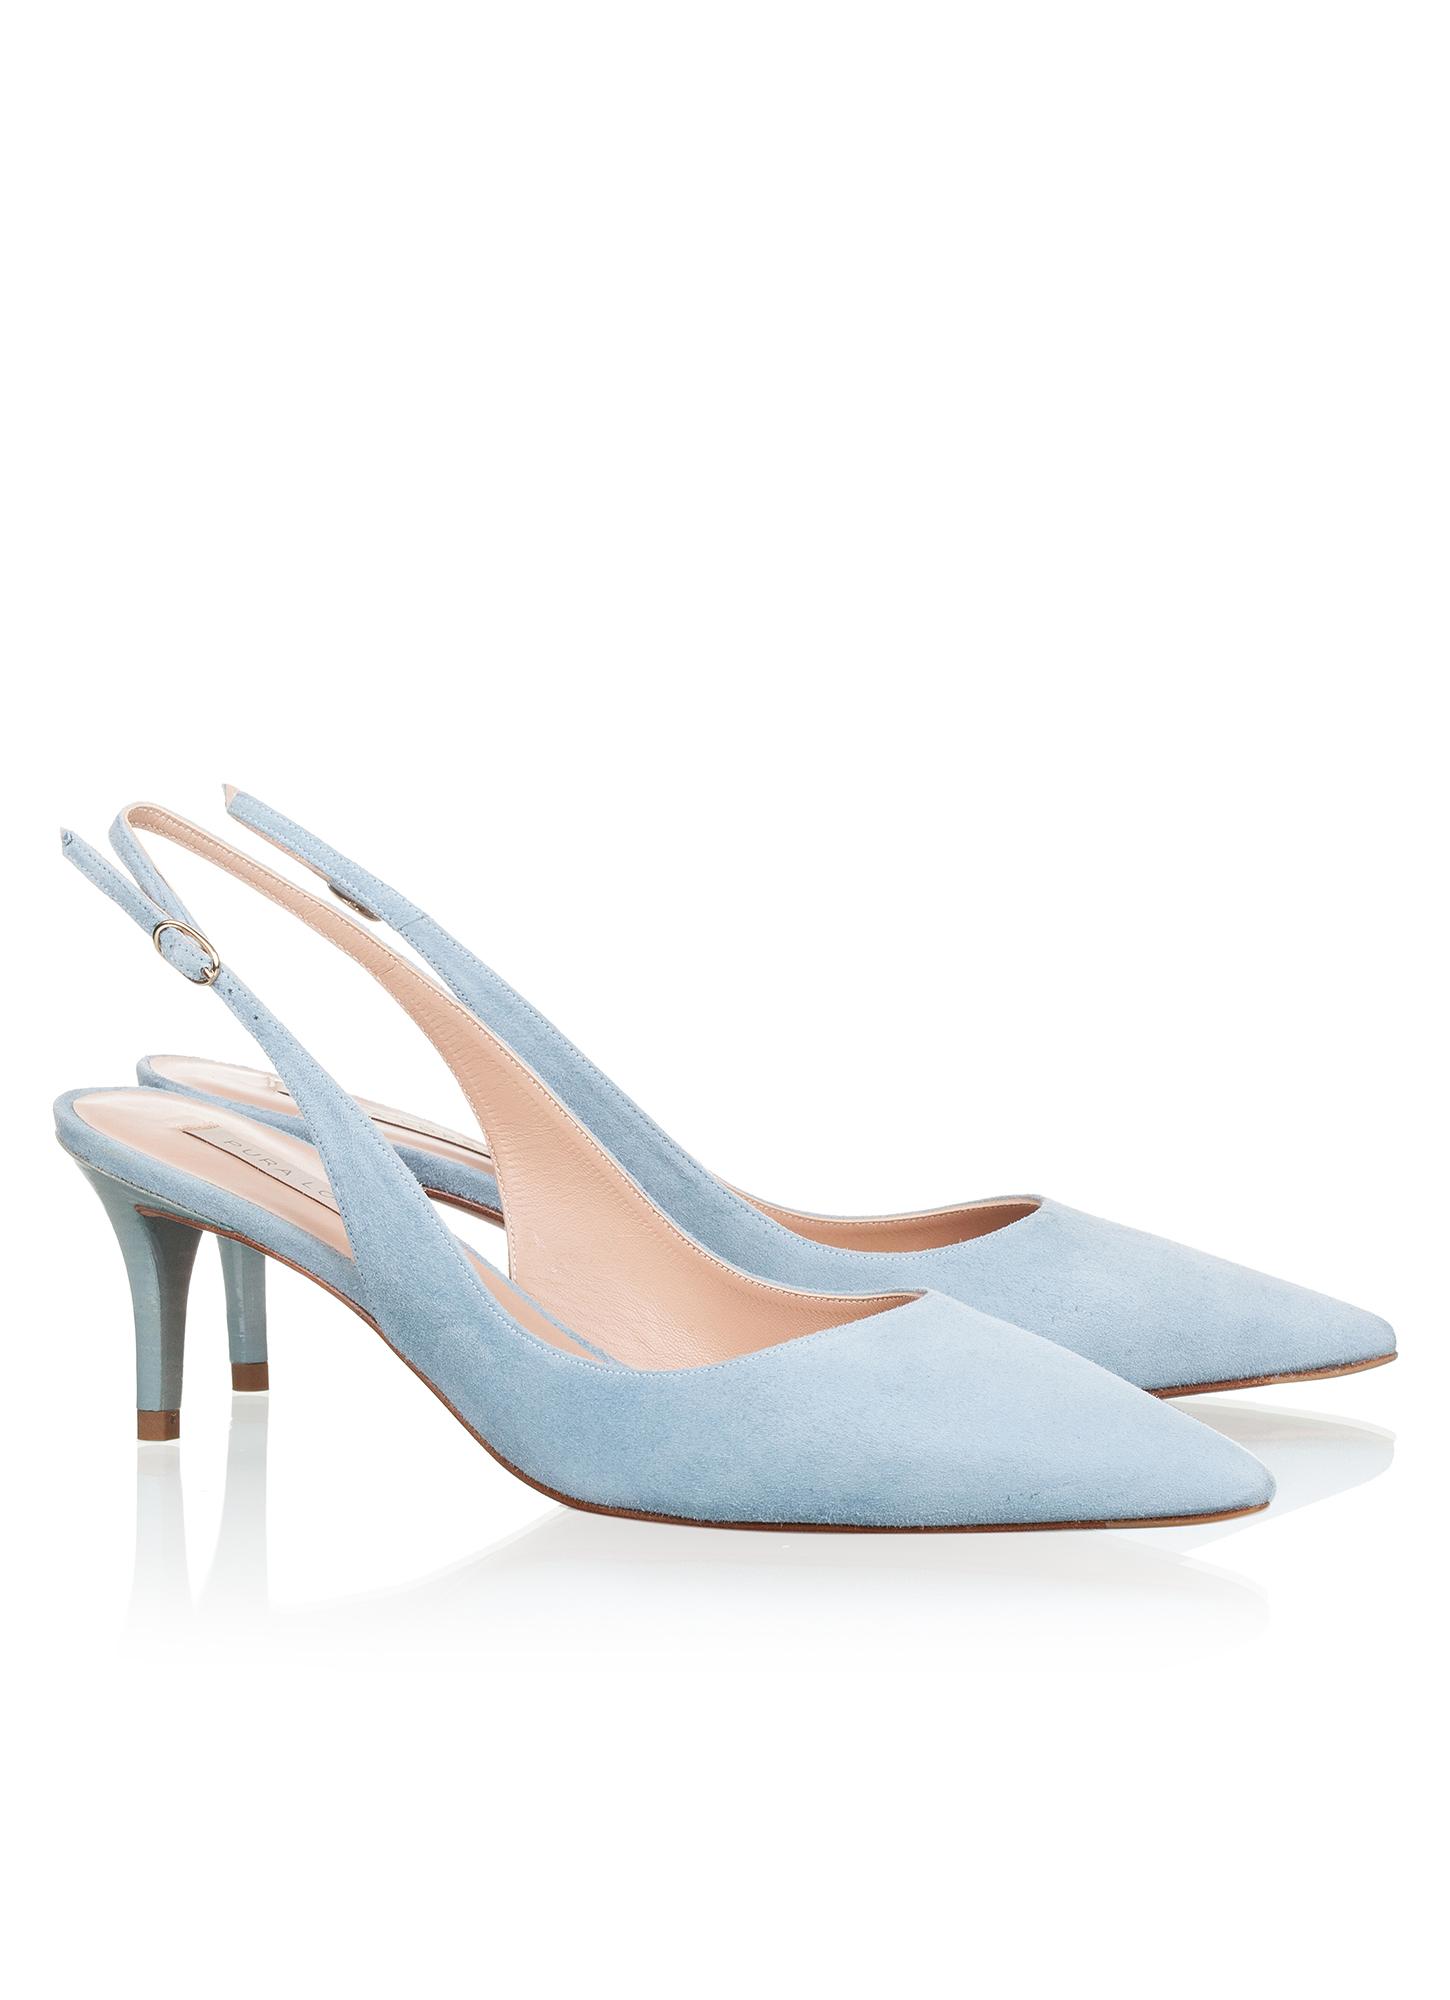 Slingback Mid Heel Pumps In Blue Suede Online Store Pura